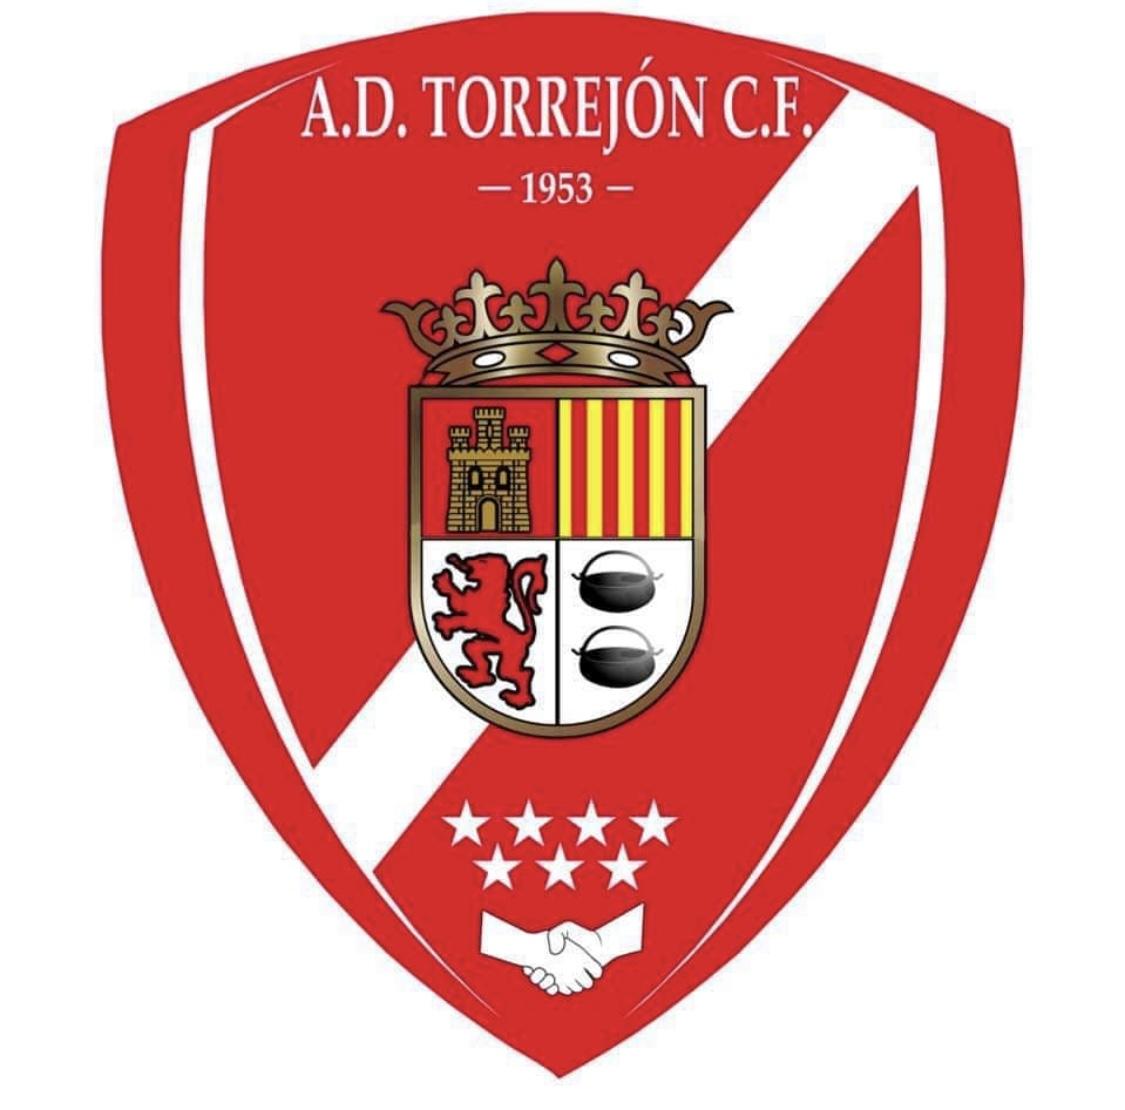 AD Torrejon CF